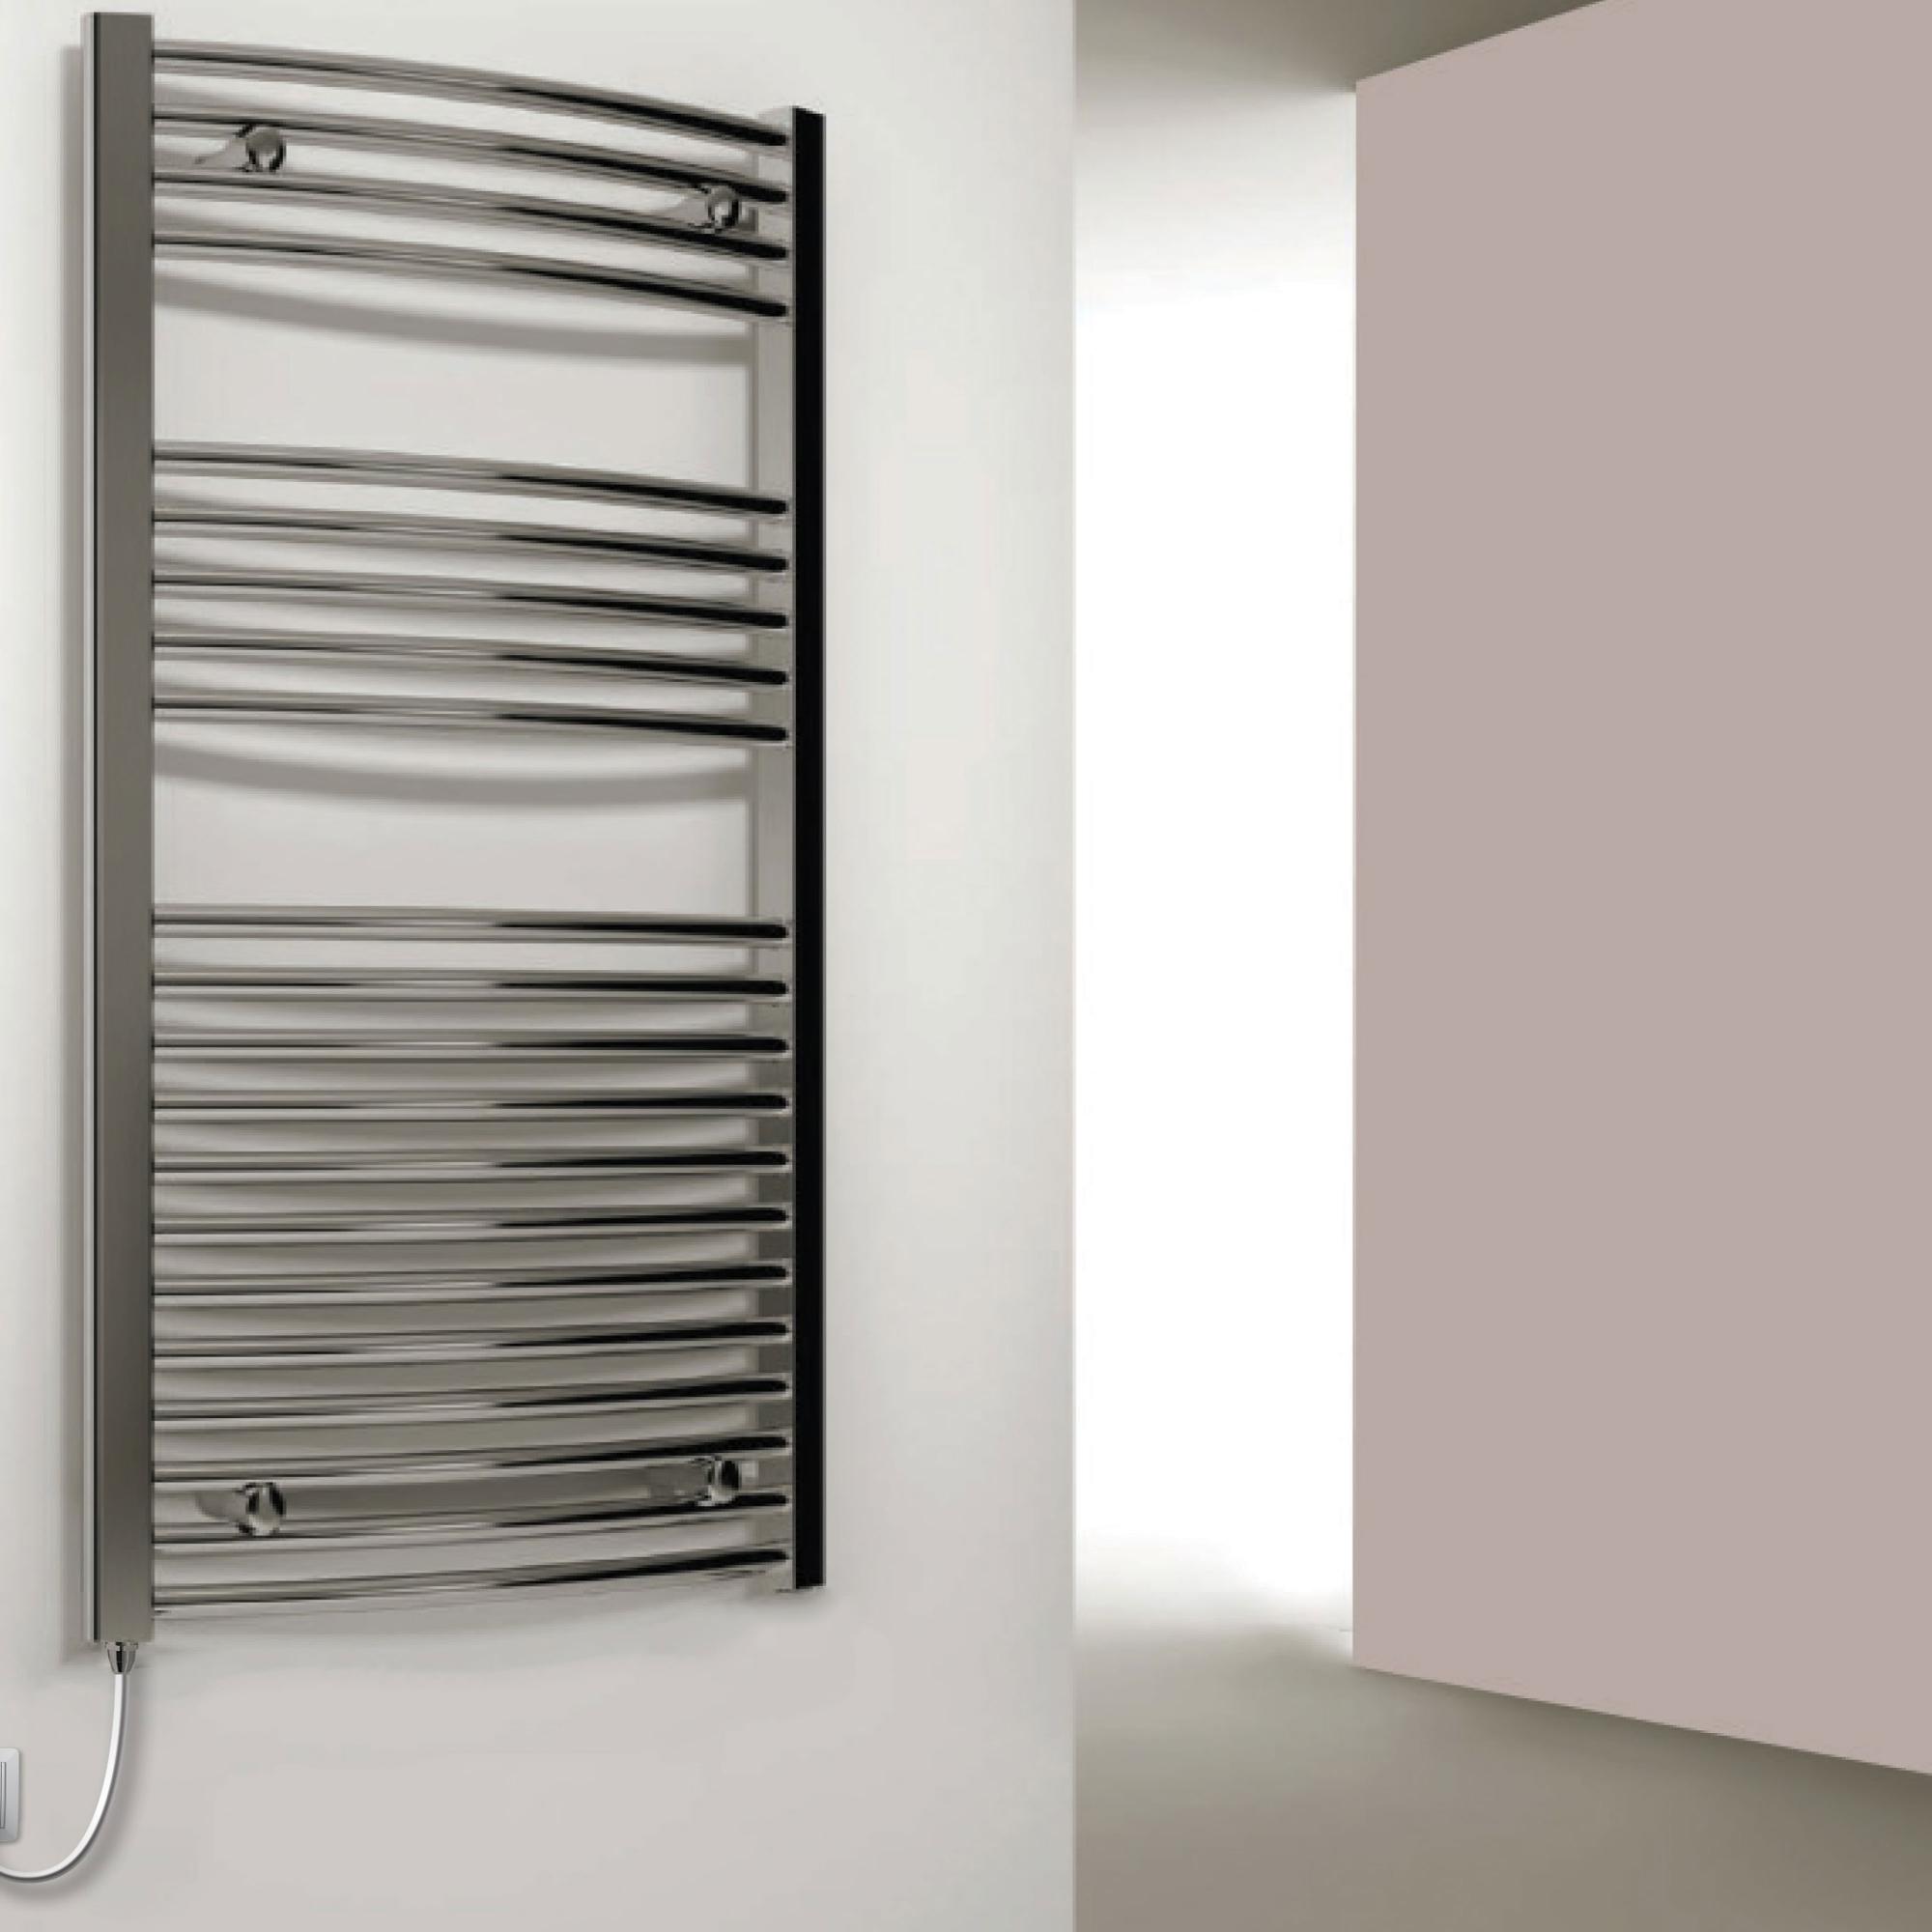 Reina Capo Curved Electric Heated Towel Rail 1600mm H x 400mm W Chrome-0